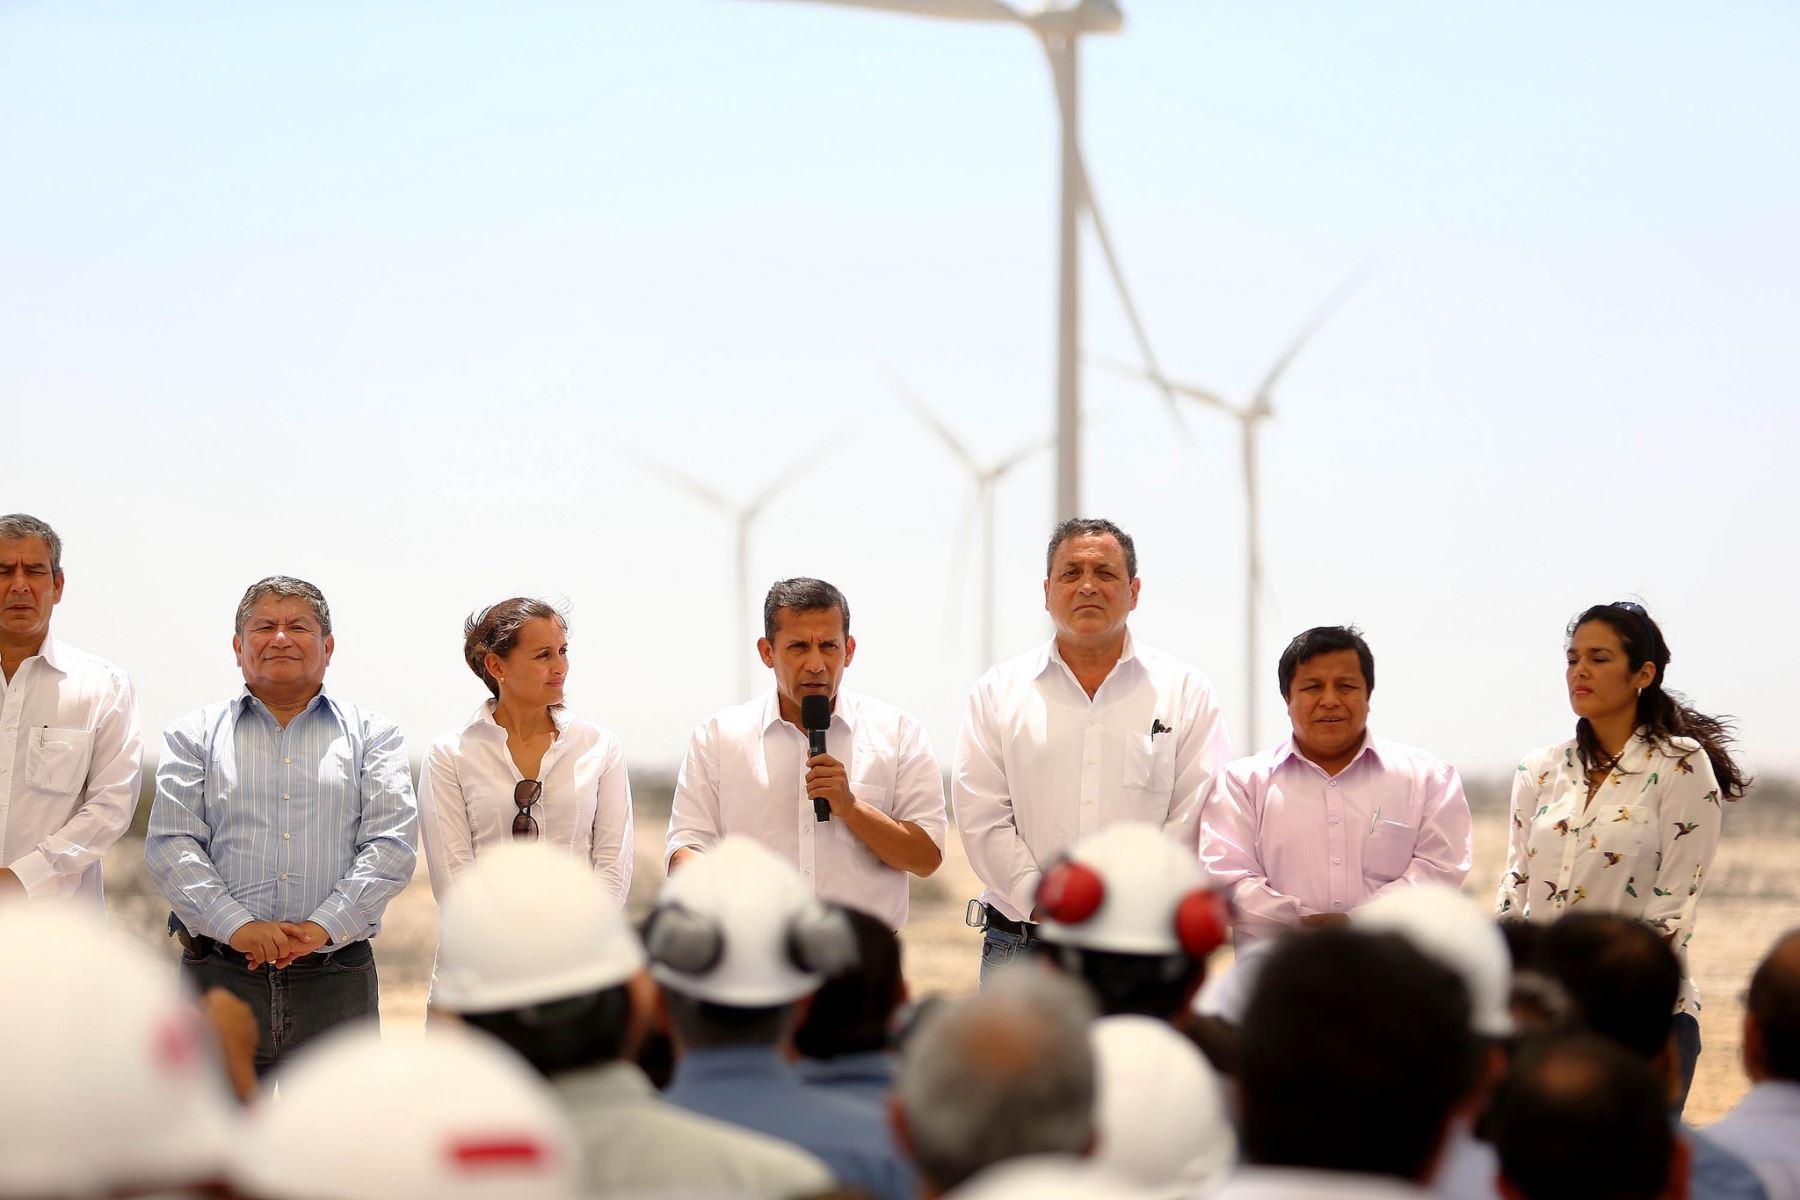 Presidente Ollanta Humala inaugura la central eólica de Talara.